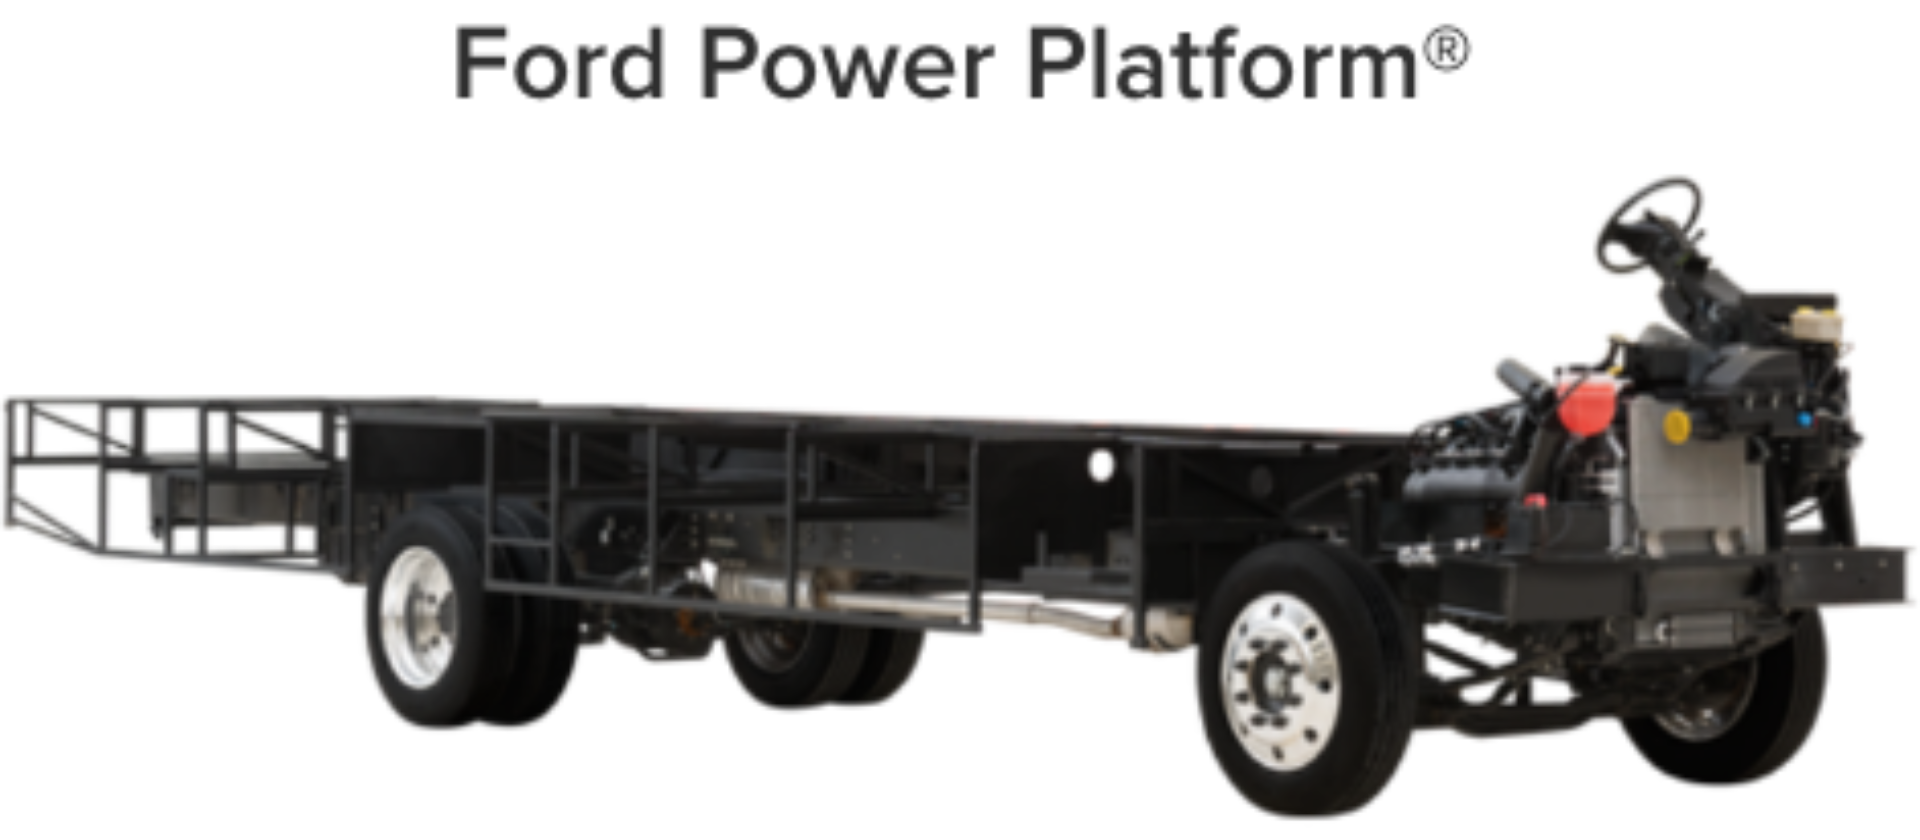 Ford power platform